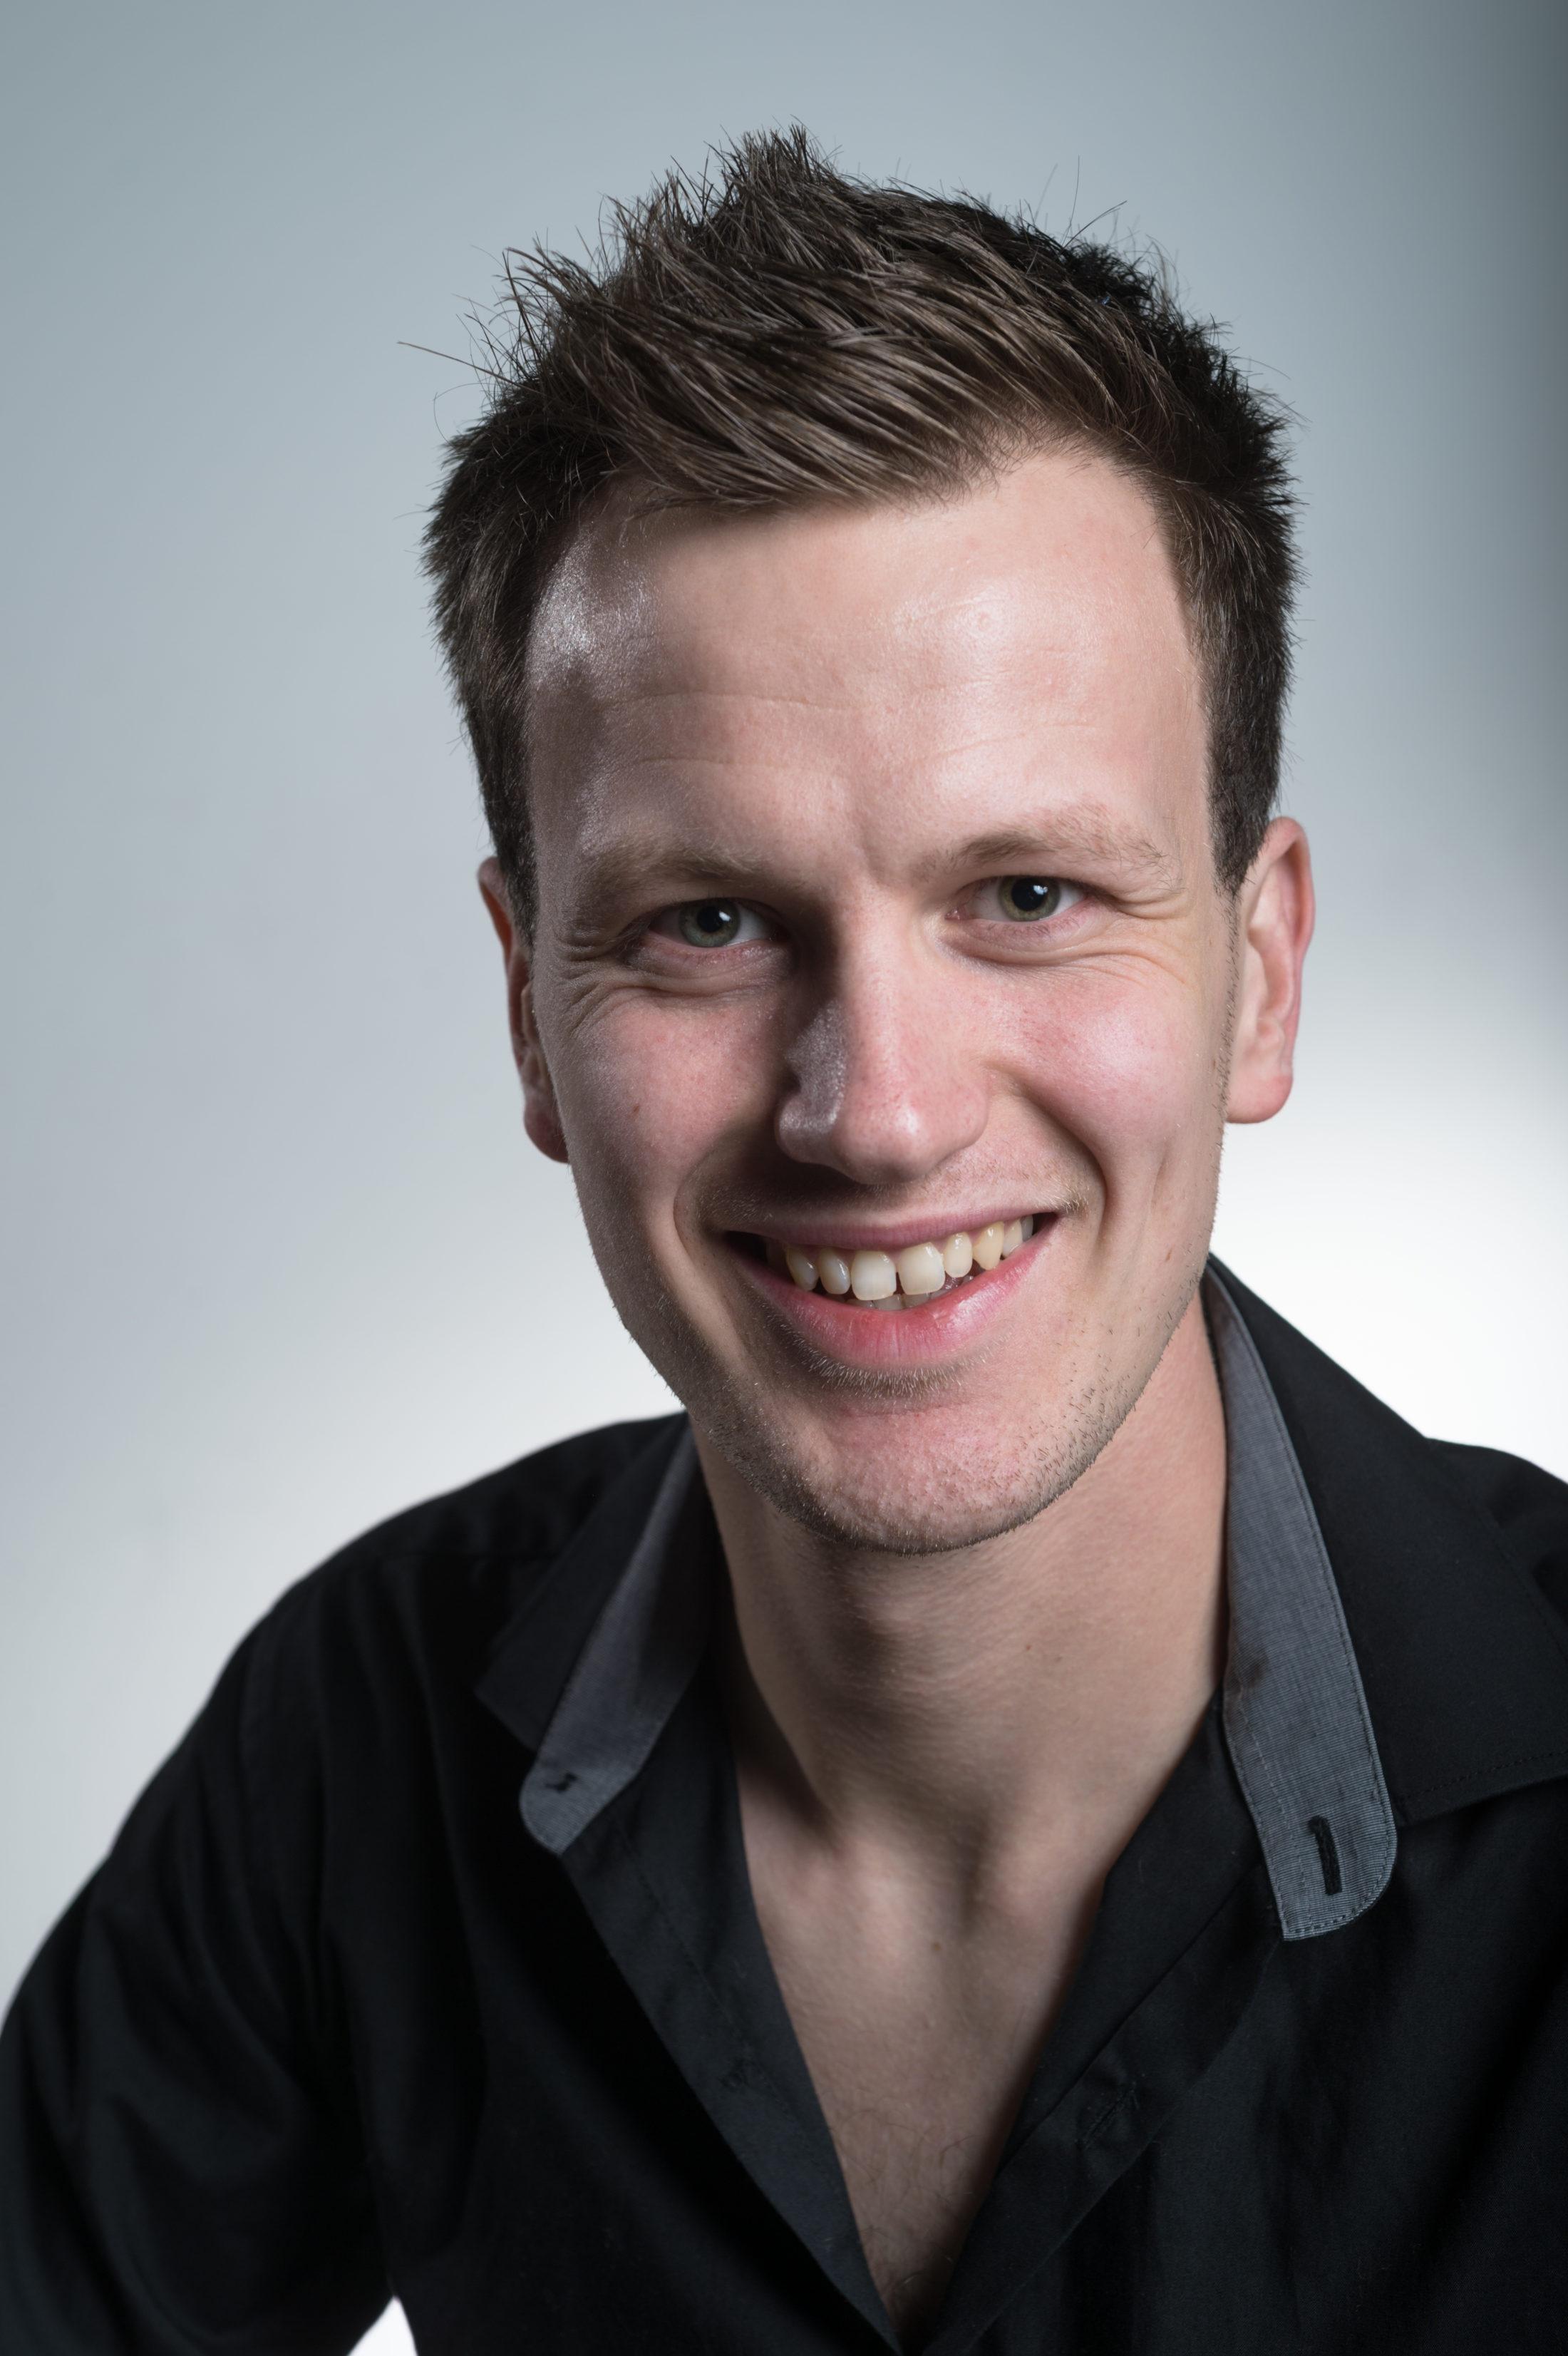 Fabian Klatt